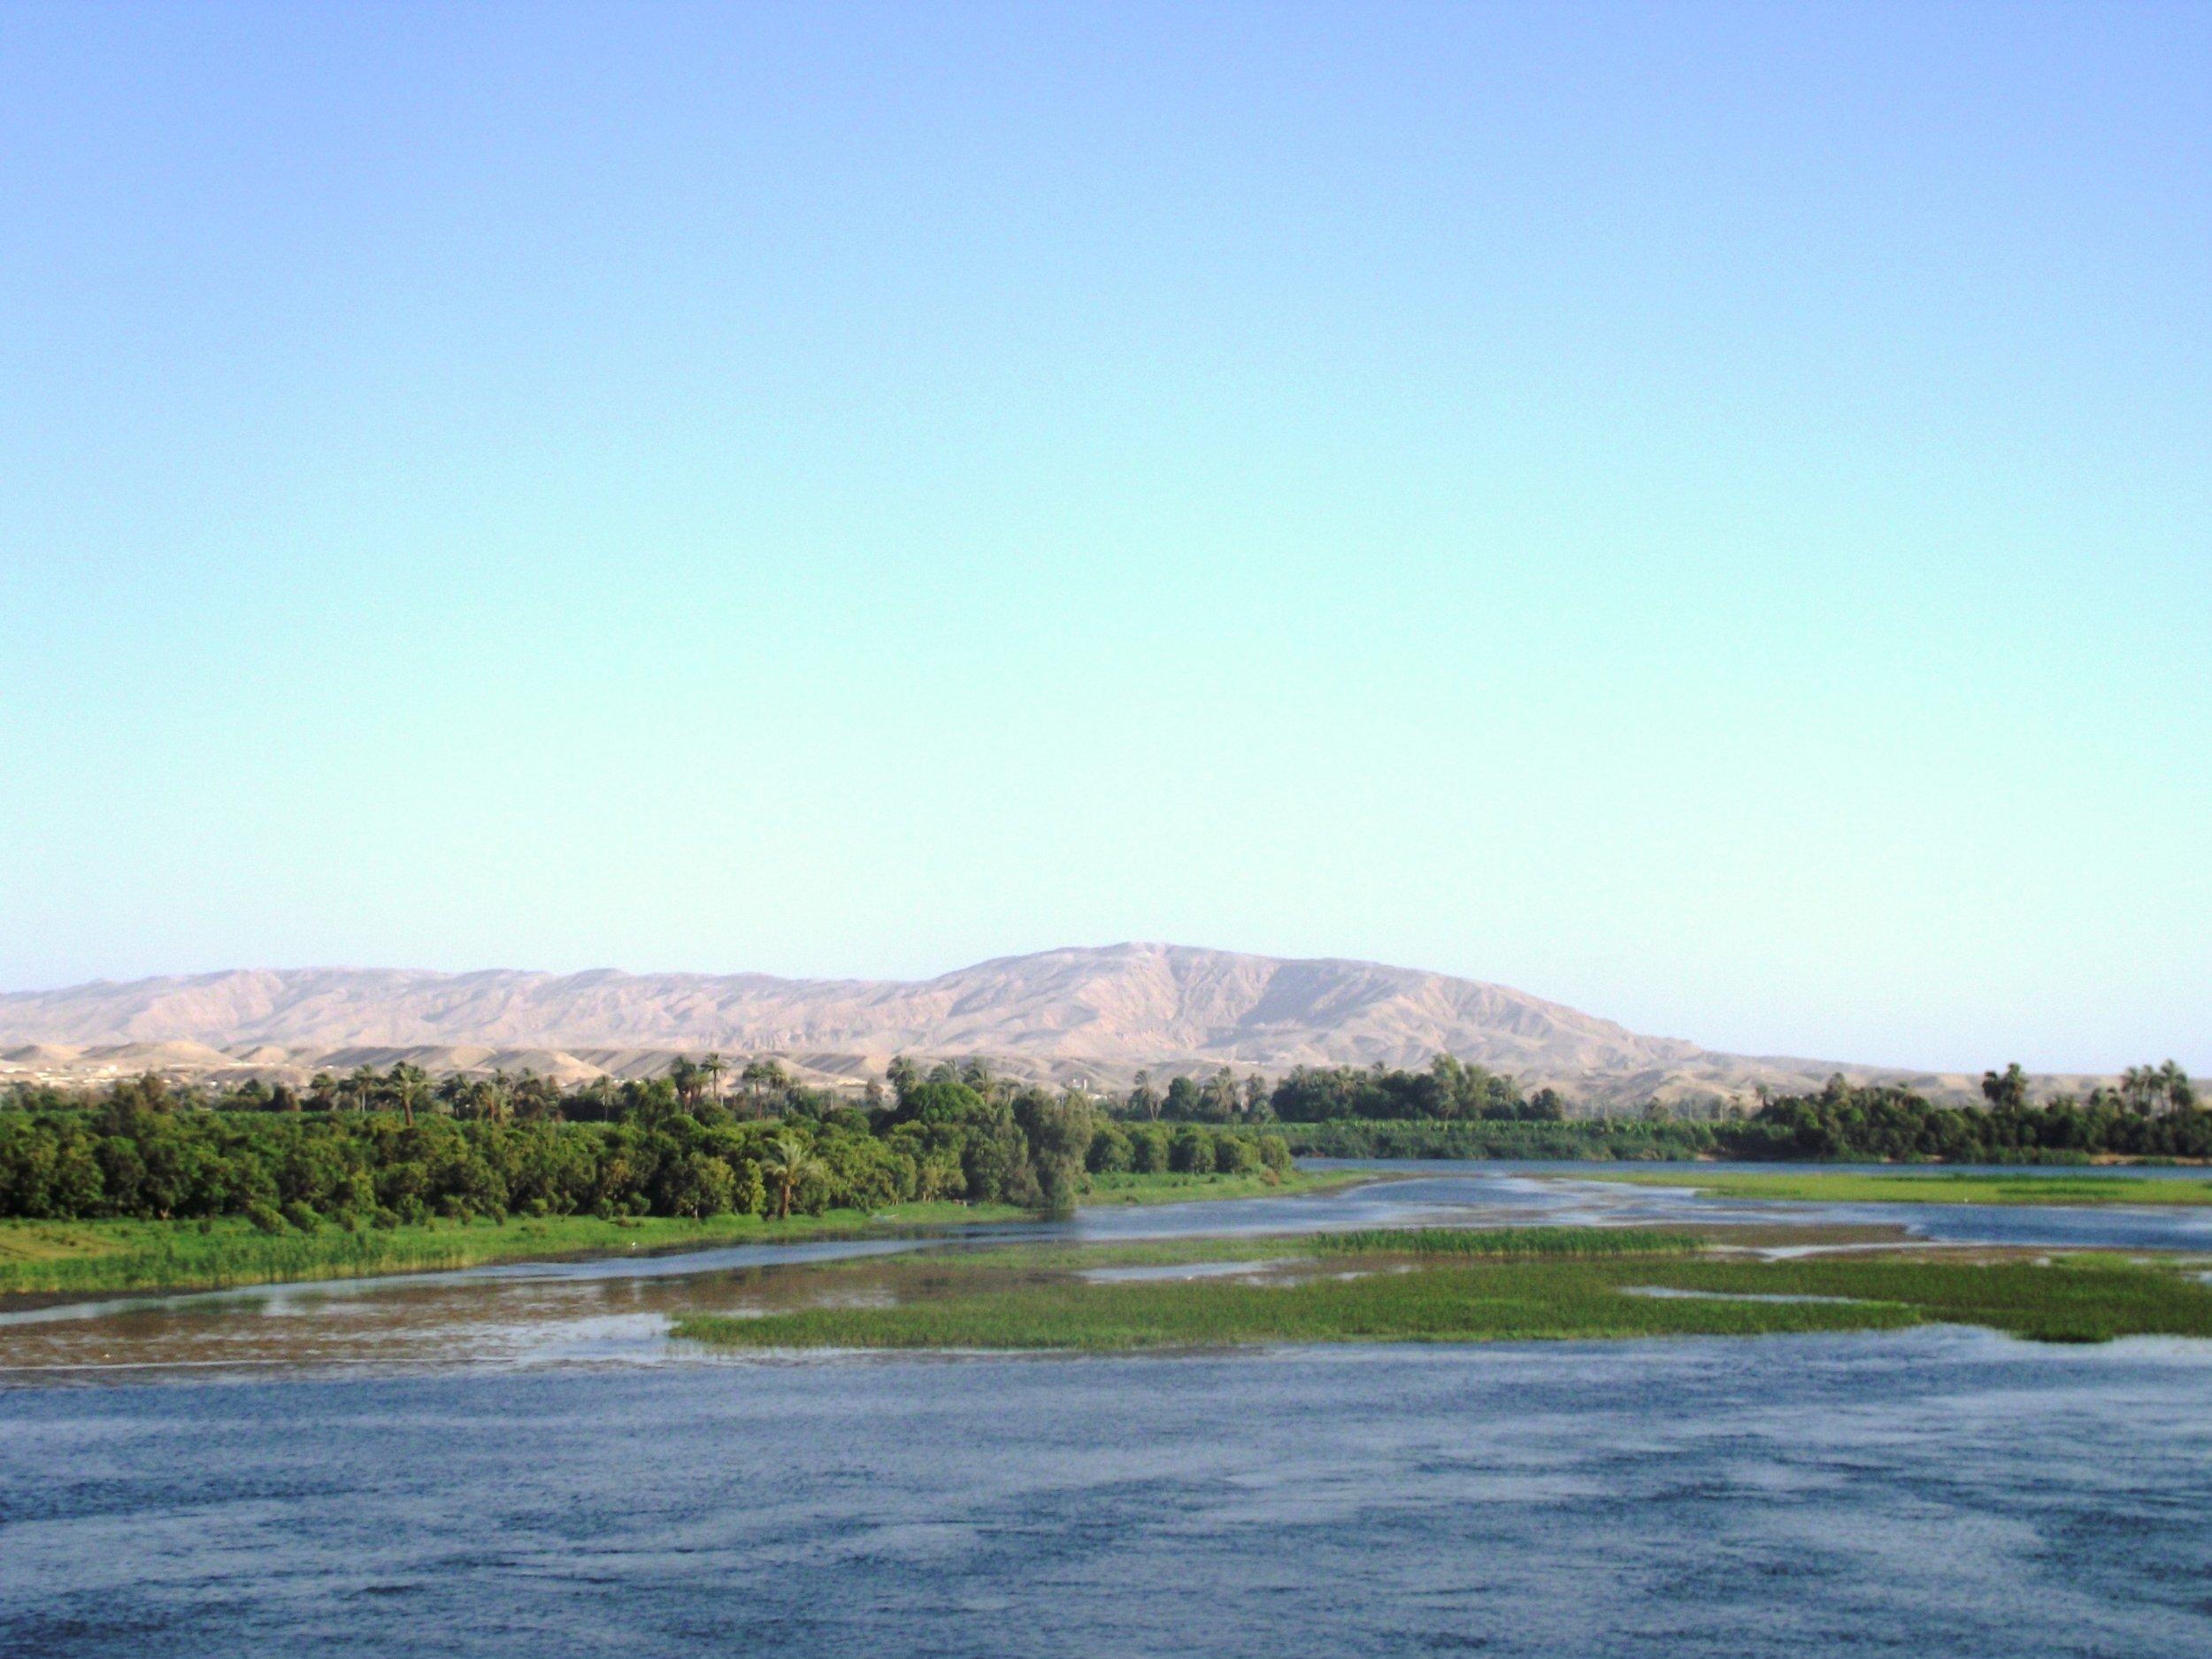 Egypt-Nile-View.jpg